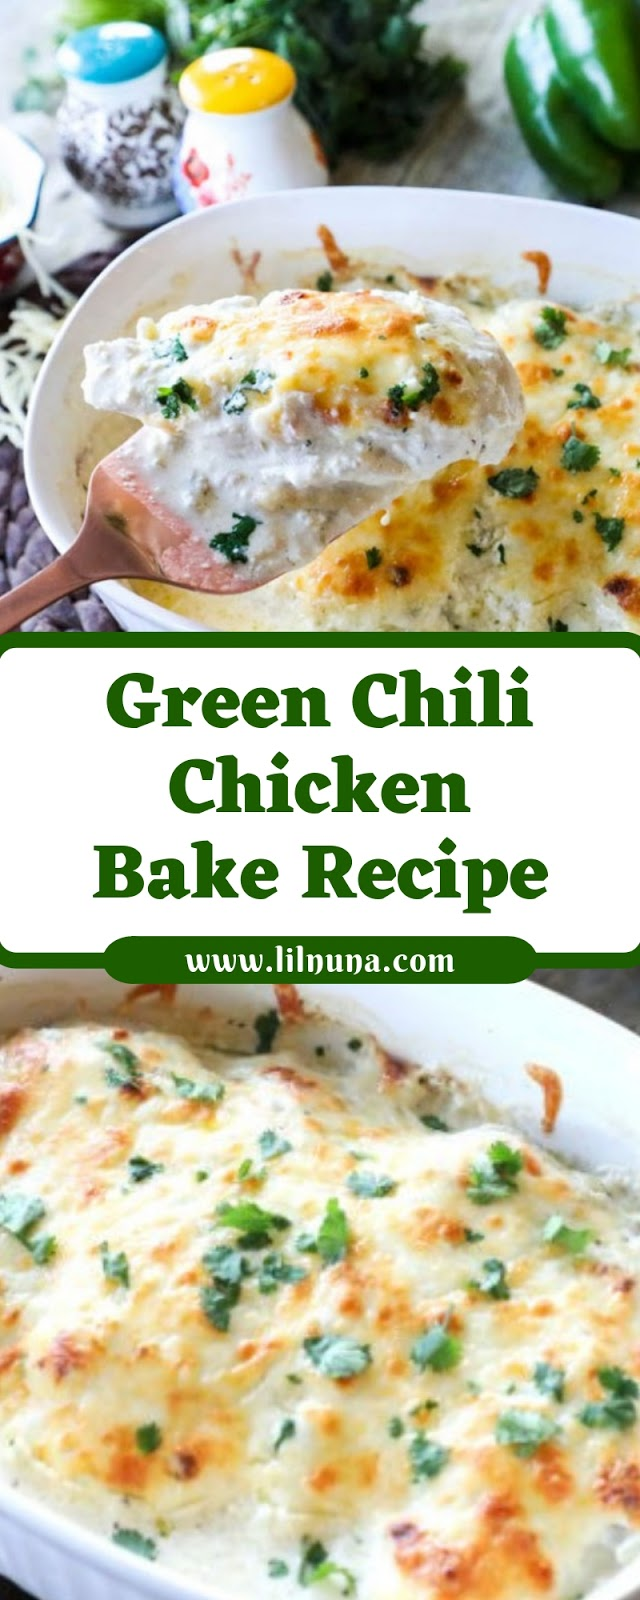 Green Chili Chicken Bake Recipe